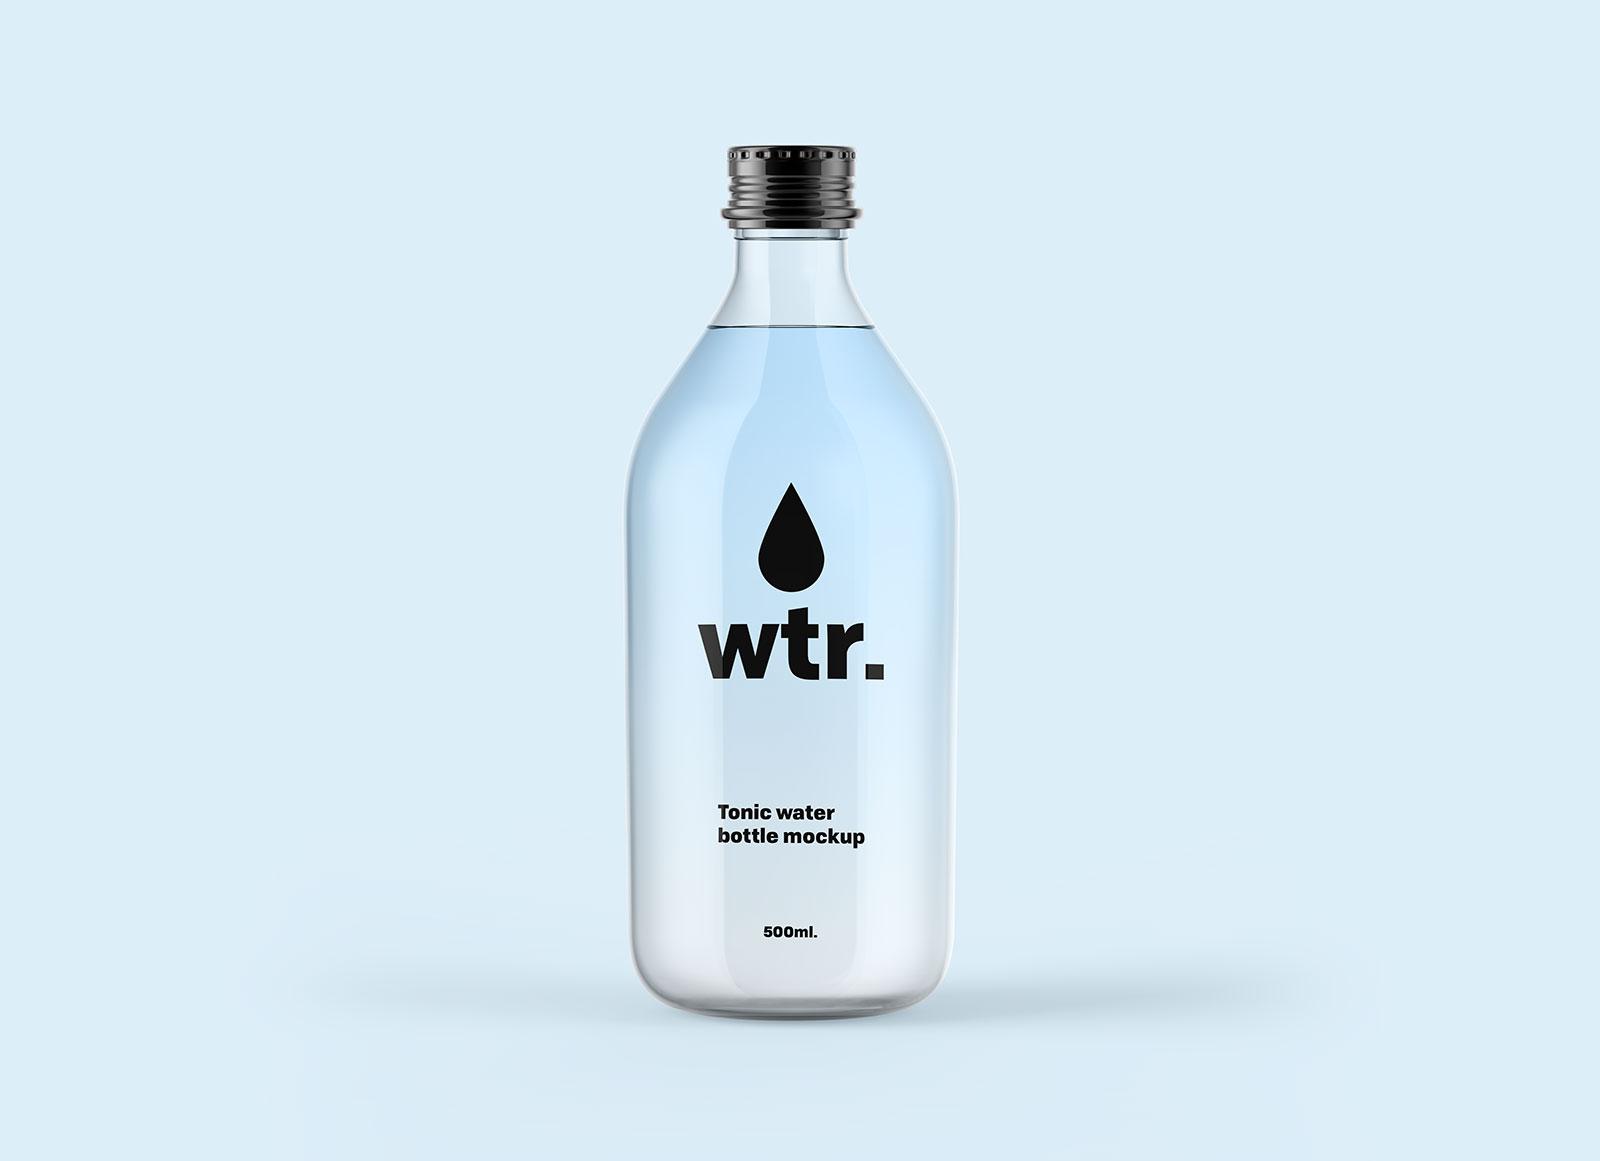 Free-Tonic-Glass-Water-Bottle-Mockup-PSD